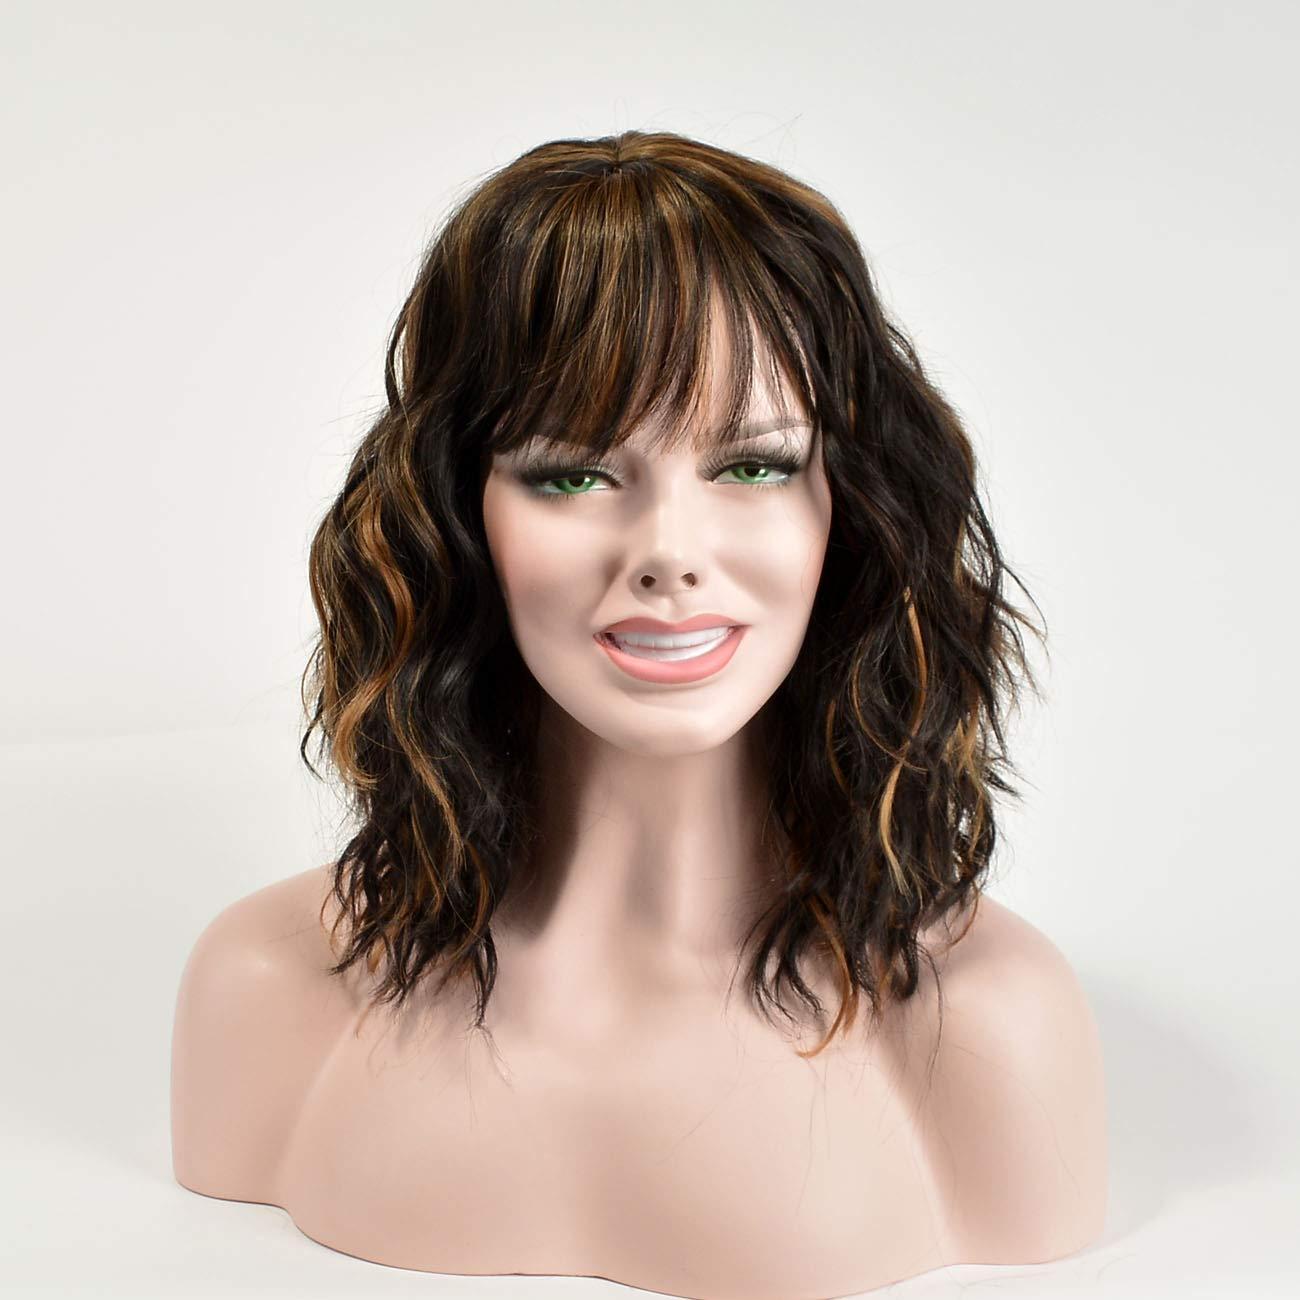 Foruiya Synthetic Short Max 59% OFF Curly Bob Wigs W Natural Wavy Hair Bargain Weave